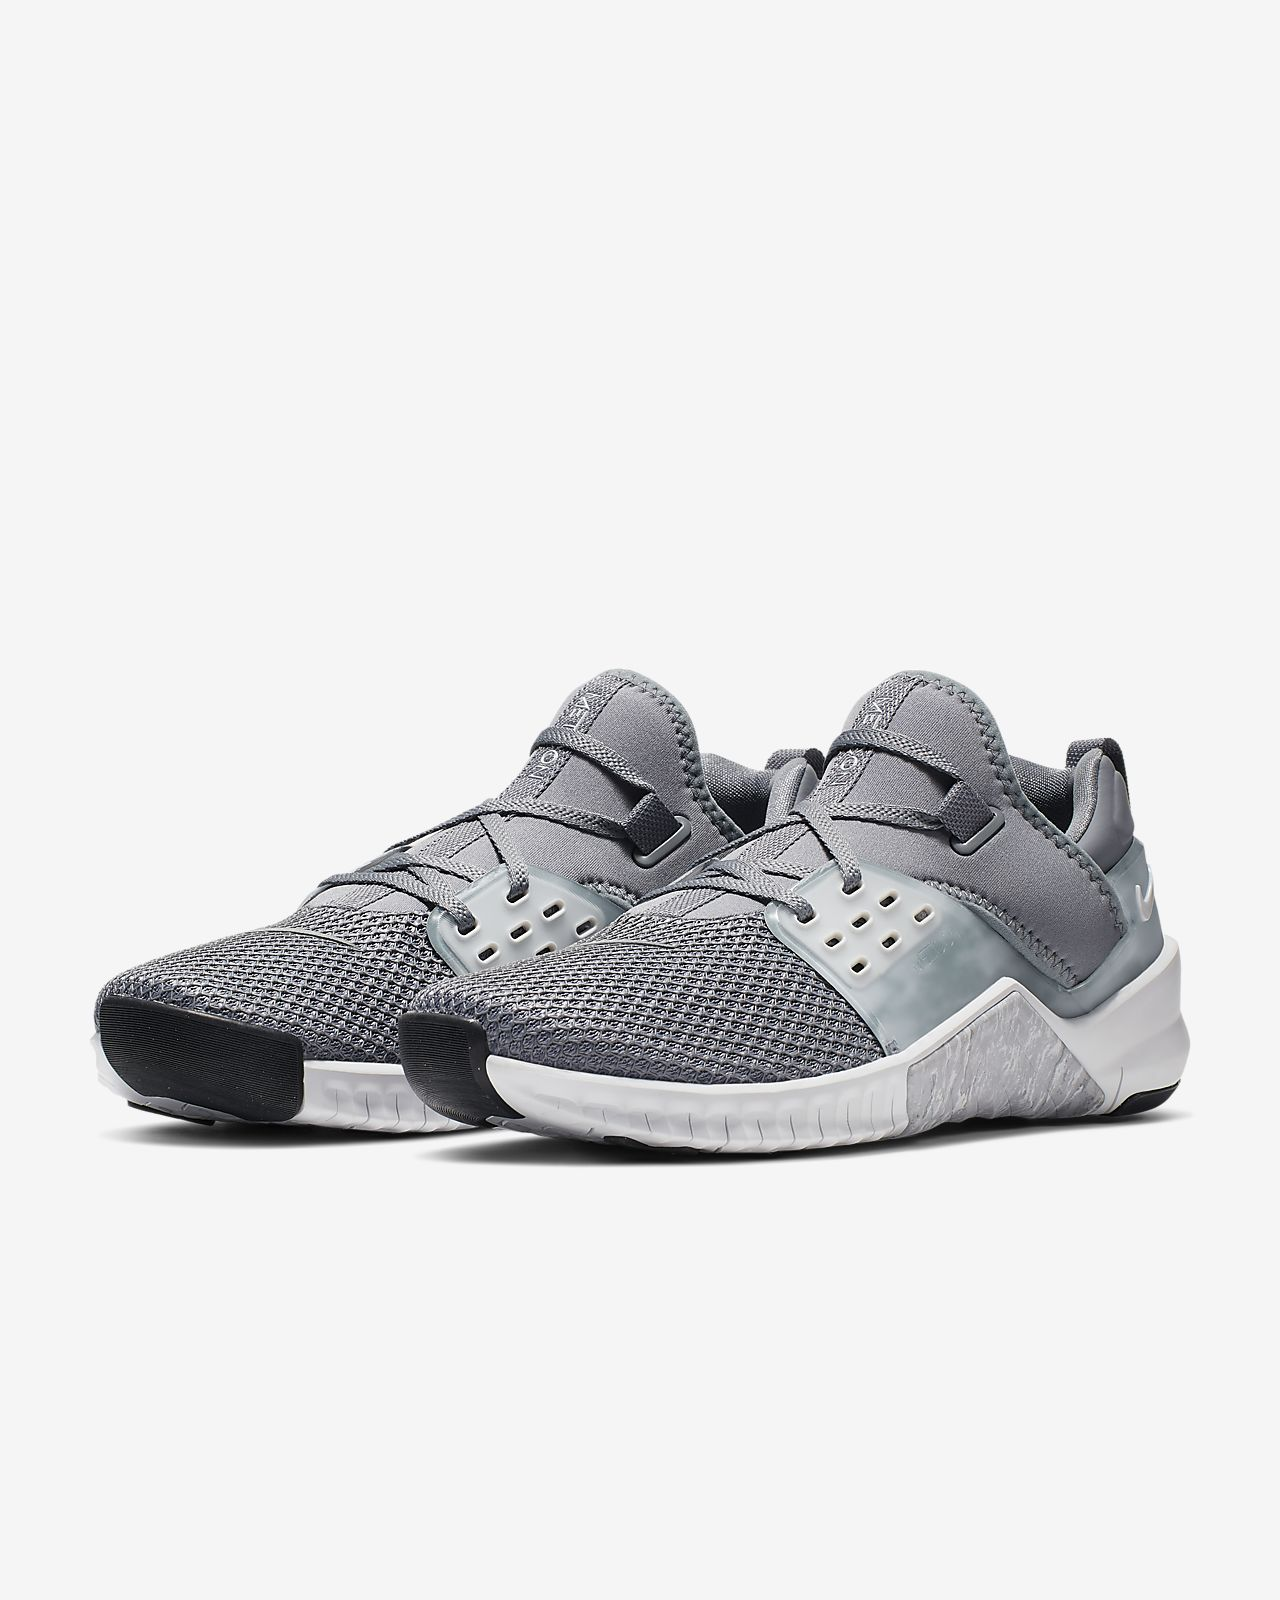 promo code 60d49 3cb79 ... Chaussure de training Nike Free X Metcon 2 pour Homme